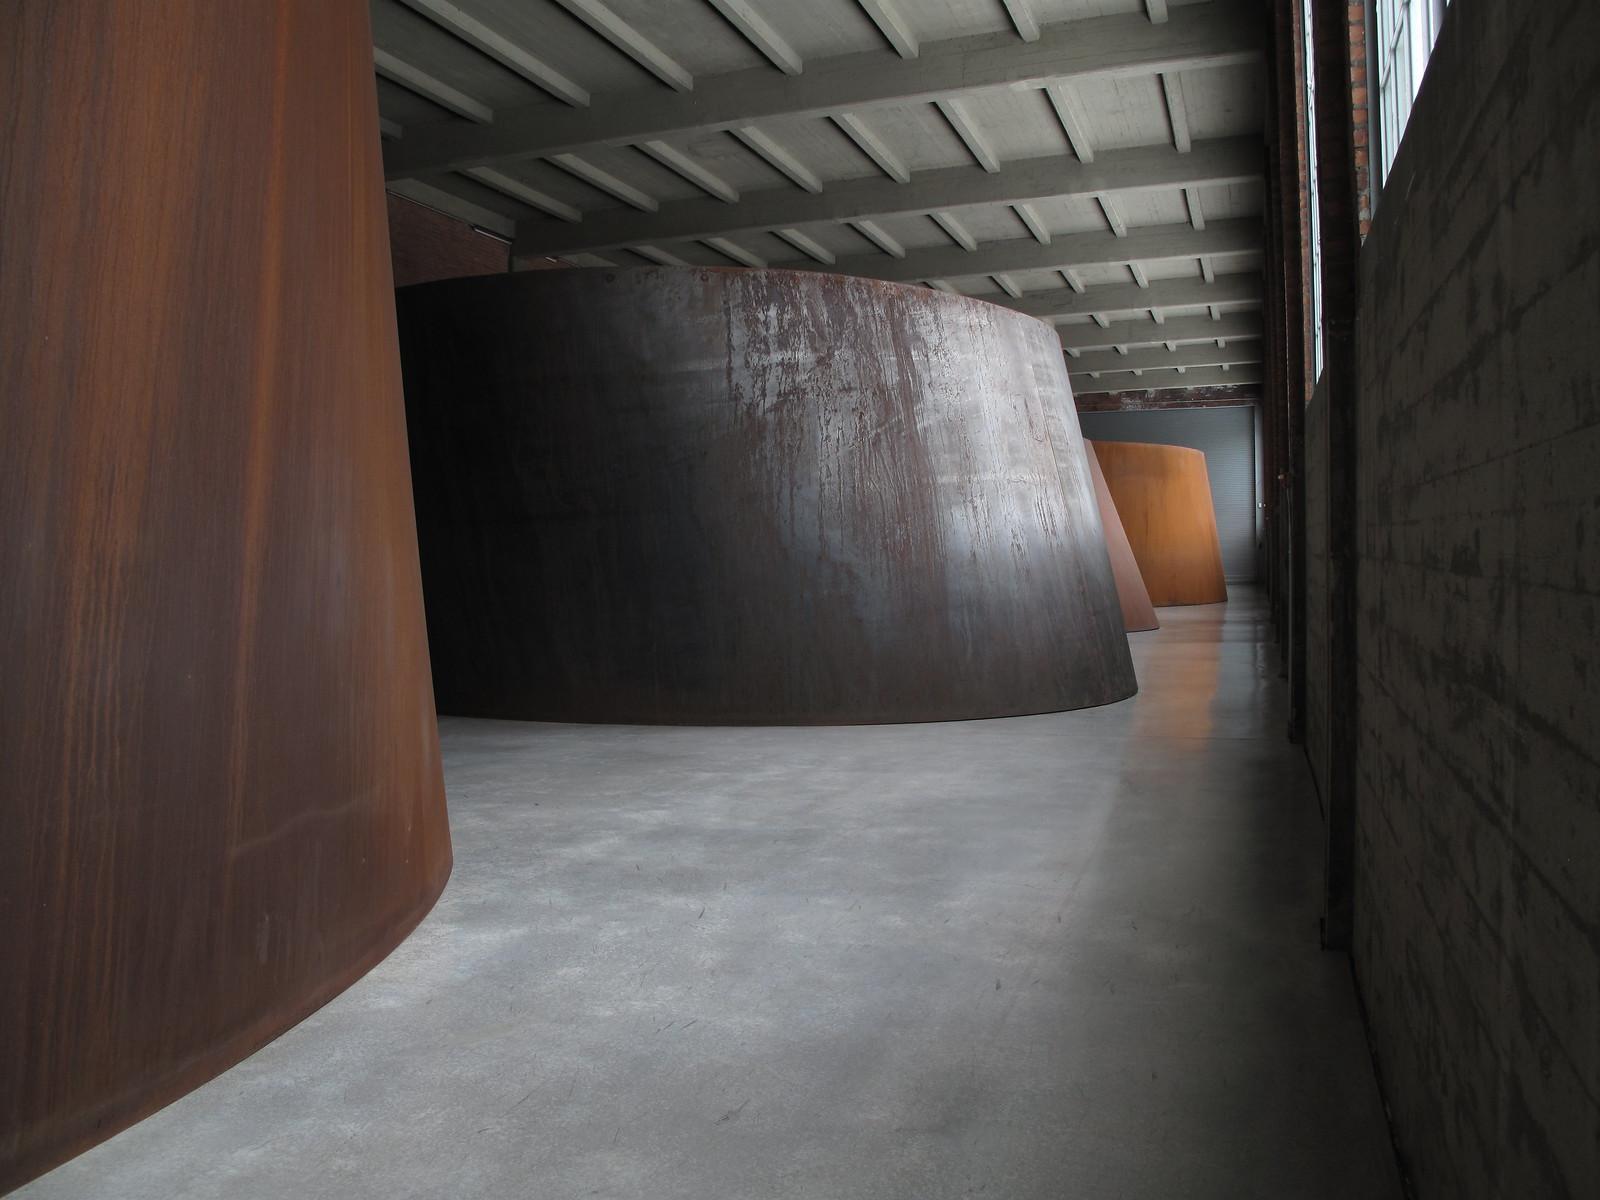 Torqued Ellipses Richard Serra Richard Serra Torqued Ellipses